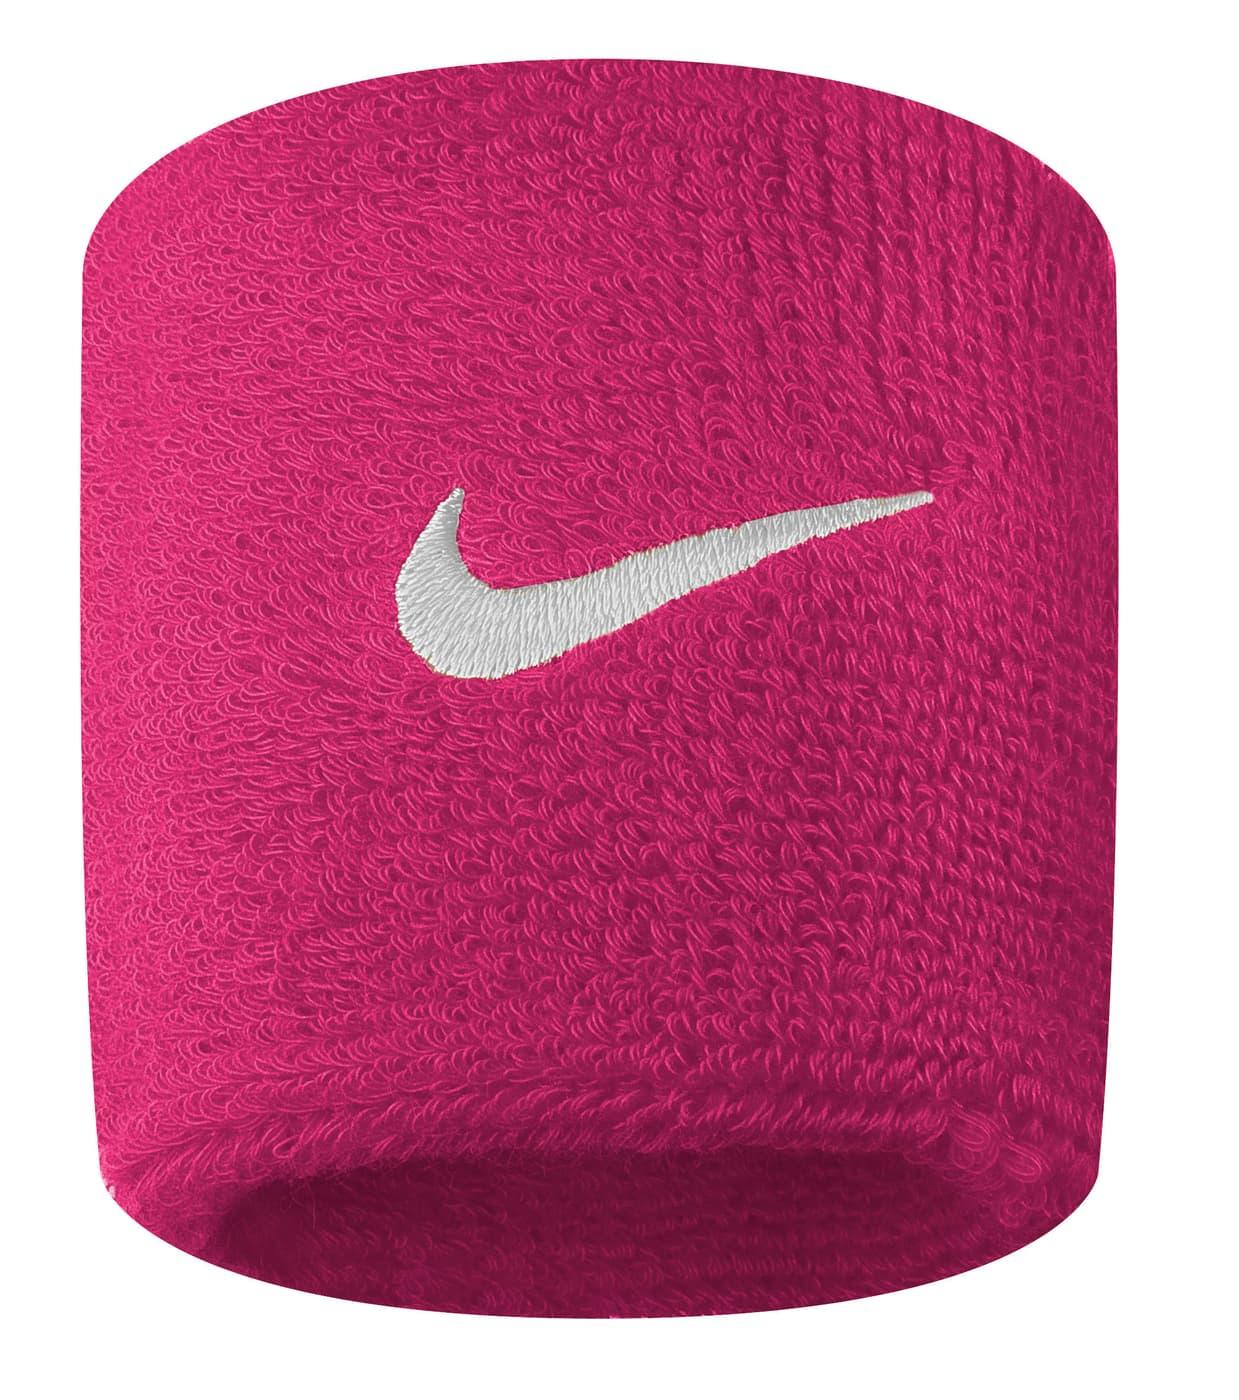 Nike Swoosh Wristbands Fascia antisudore stretta (7.6cm) unisex  a145ec8f70e1